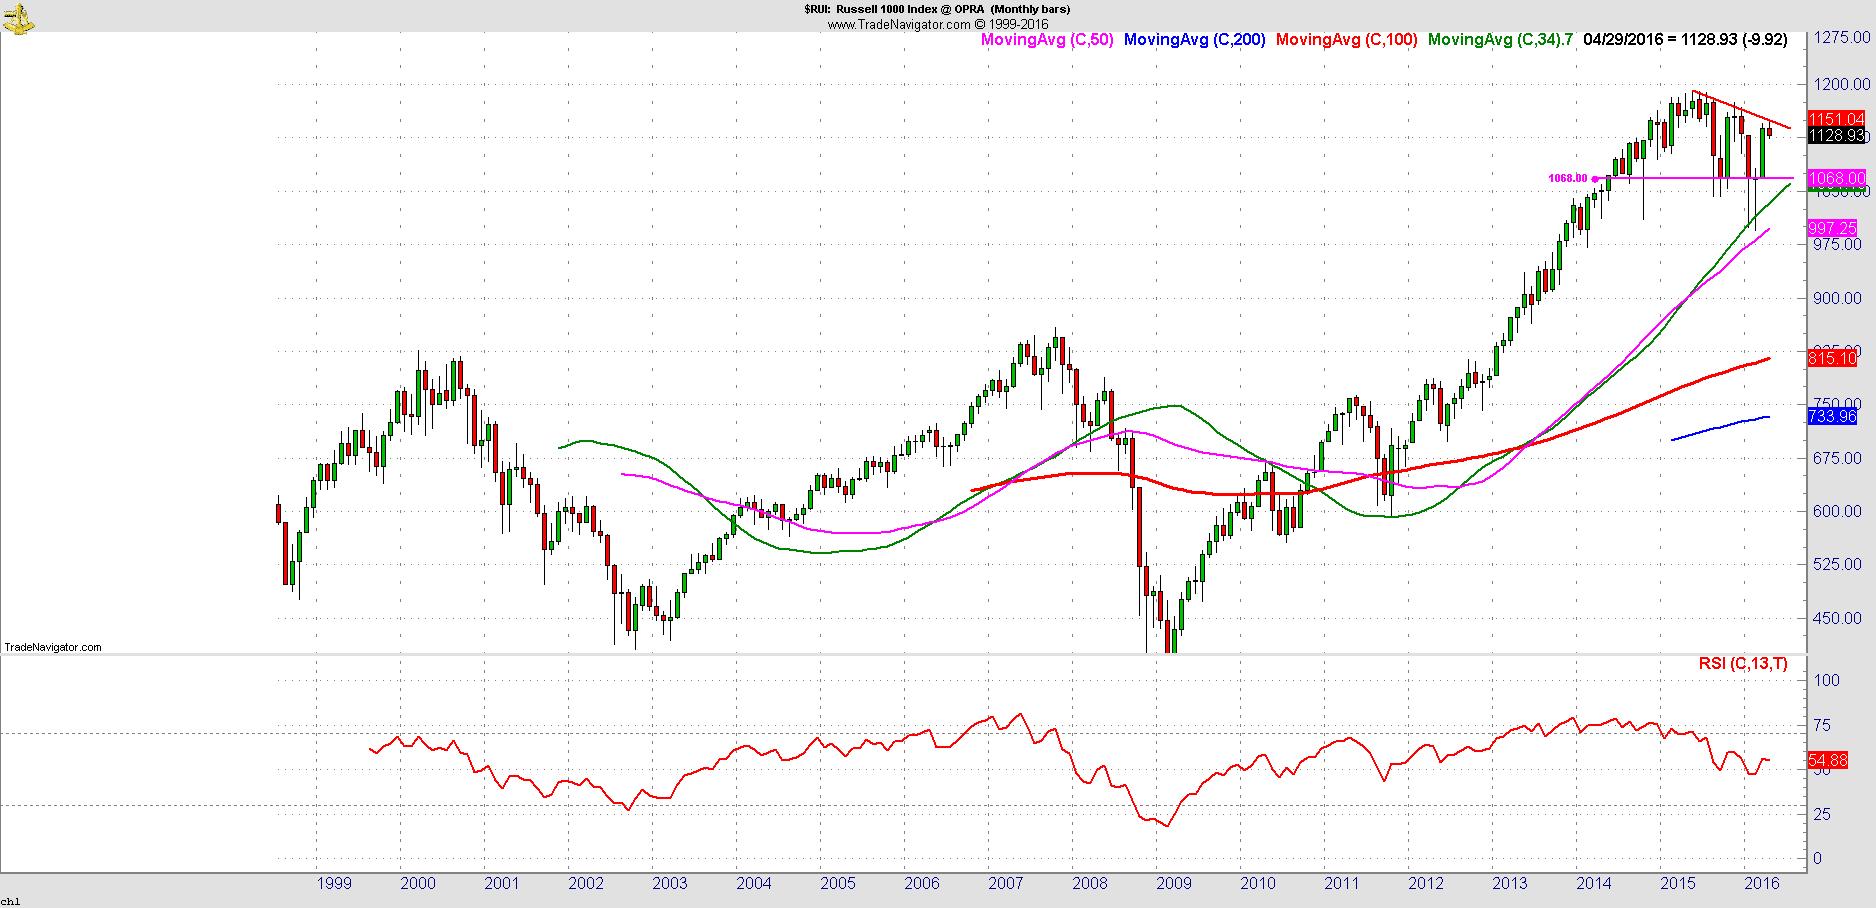 Chart picture source: Trade Navigator platform